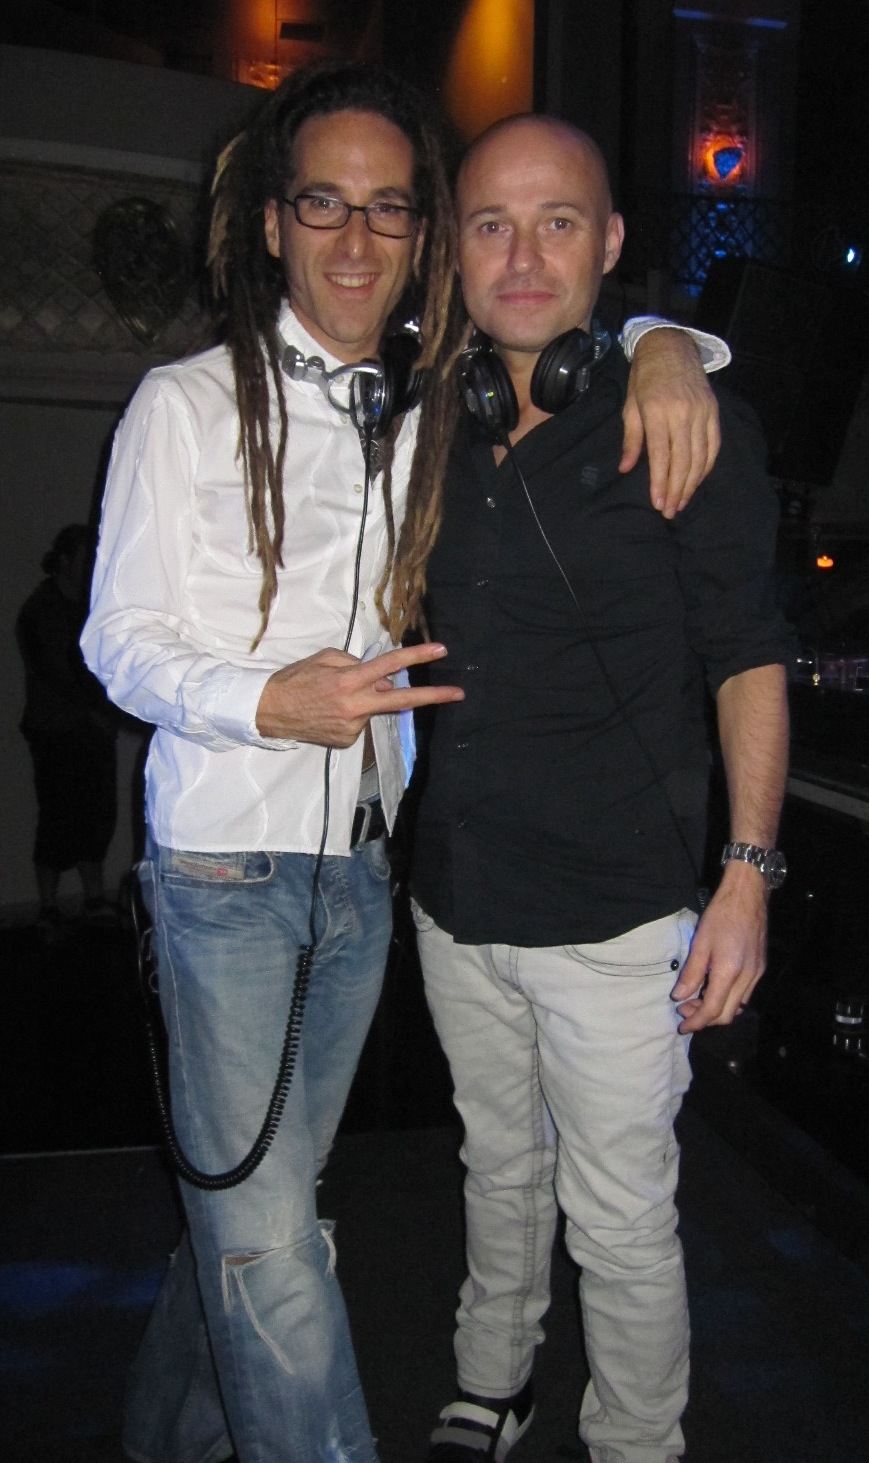 Marco V & Dirtyhertz